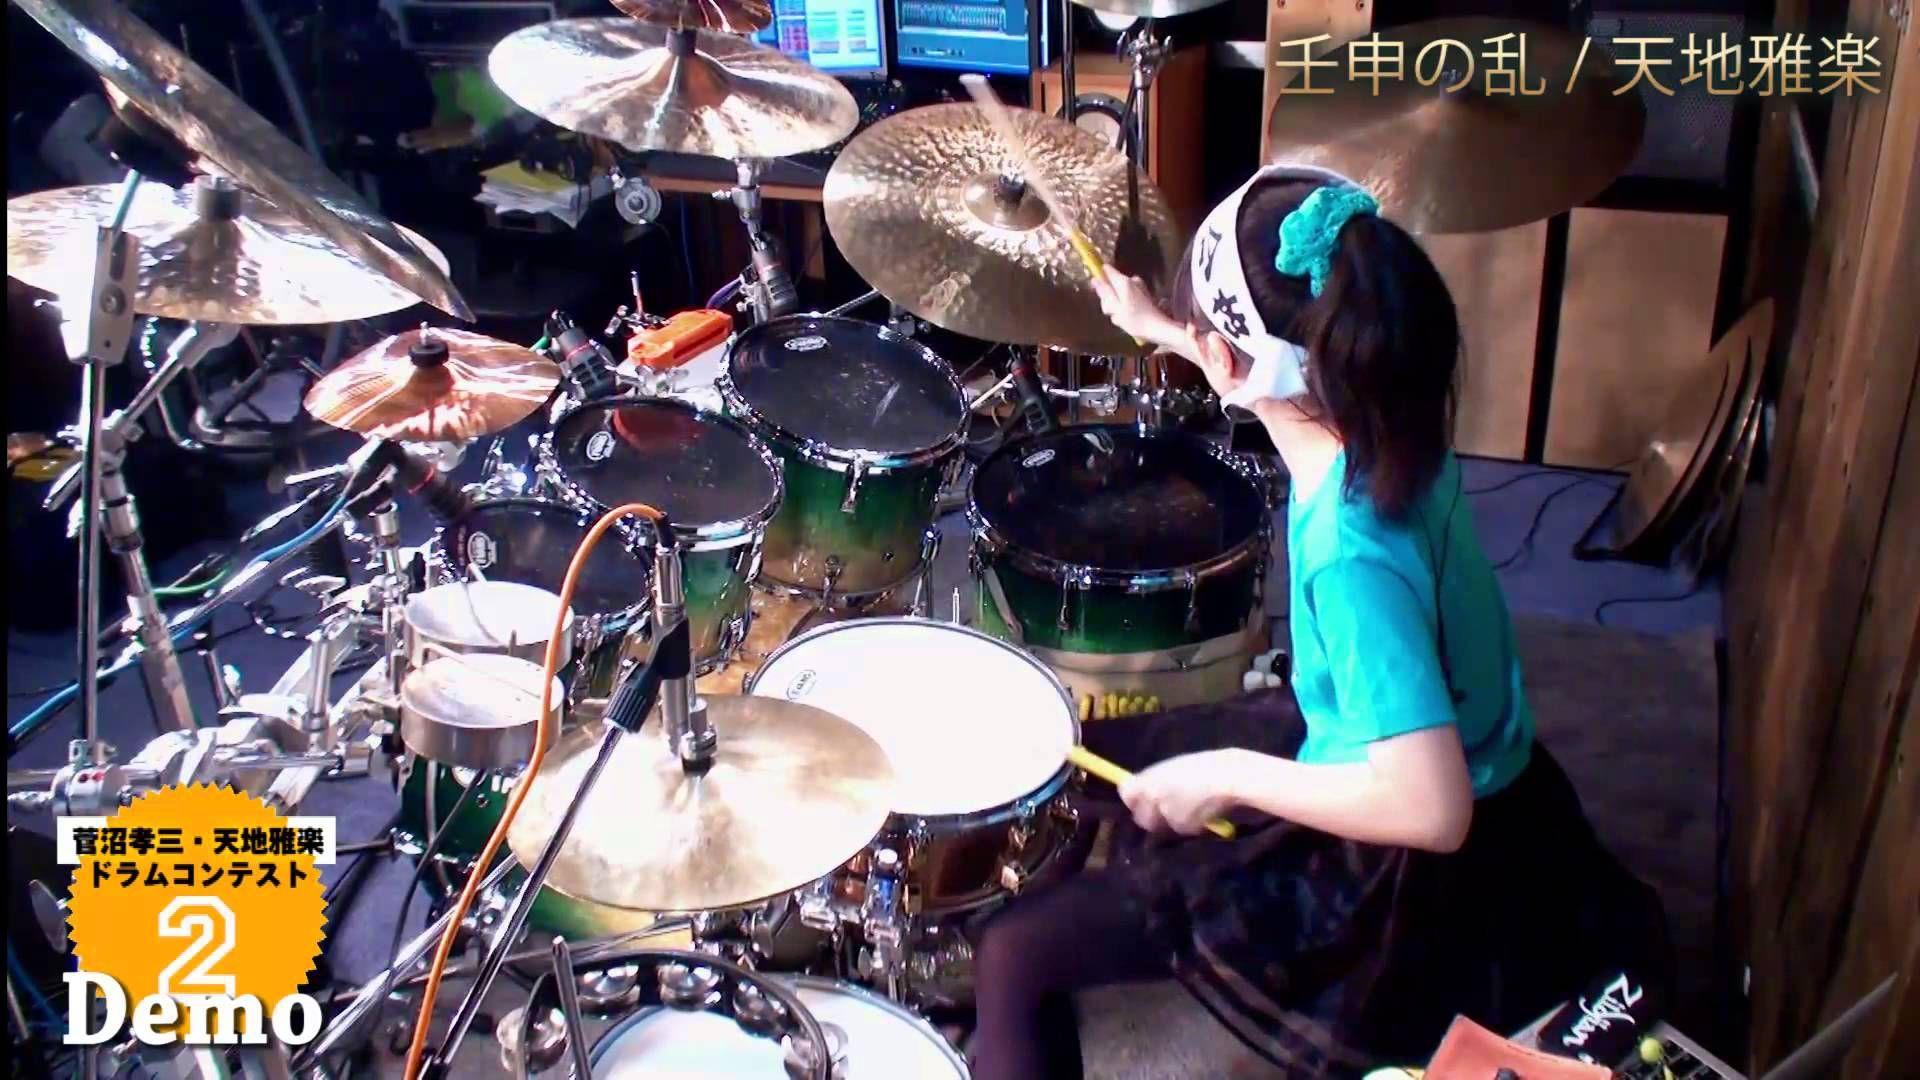 16-Year-Old Japanese Phenom Senri Kawaguchi Performs A -5269